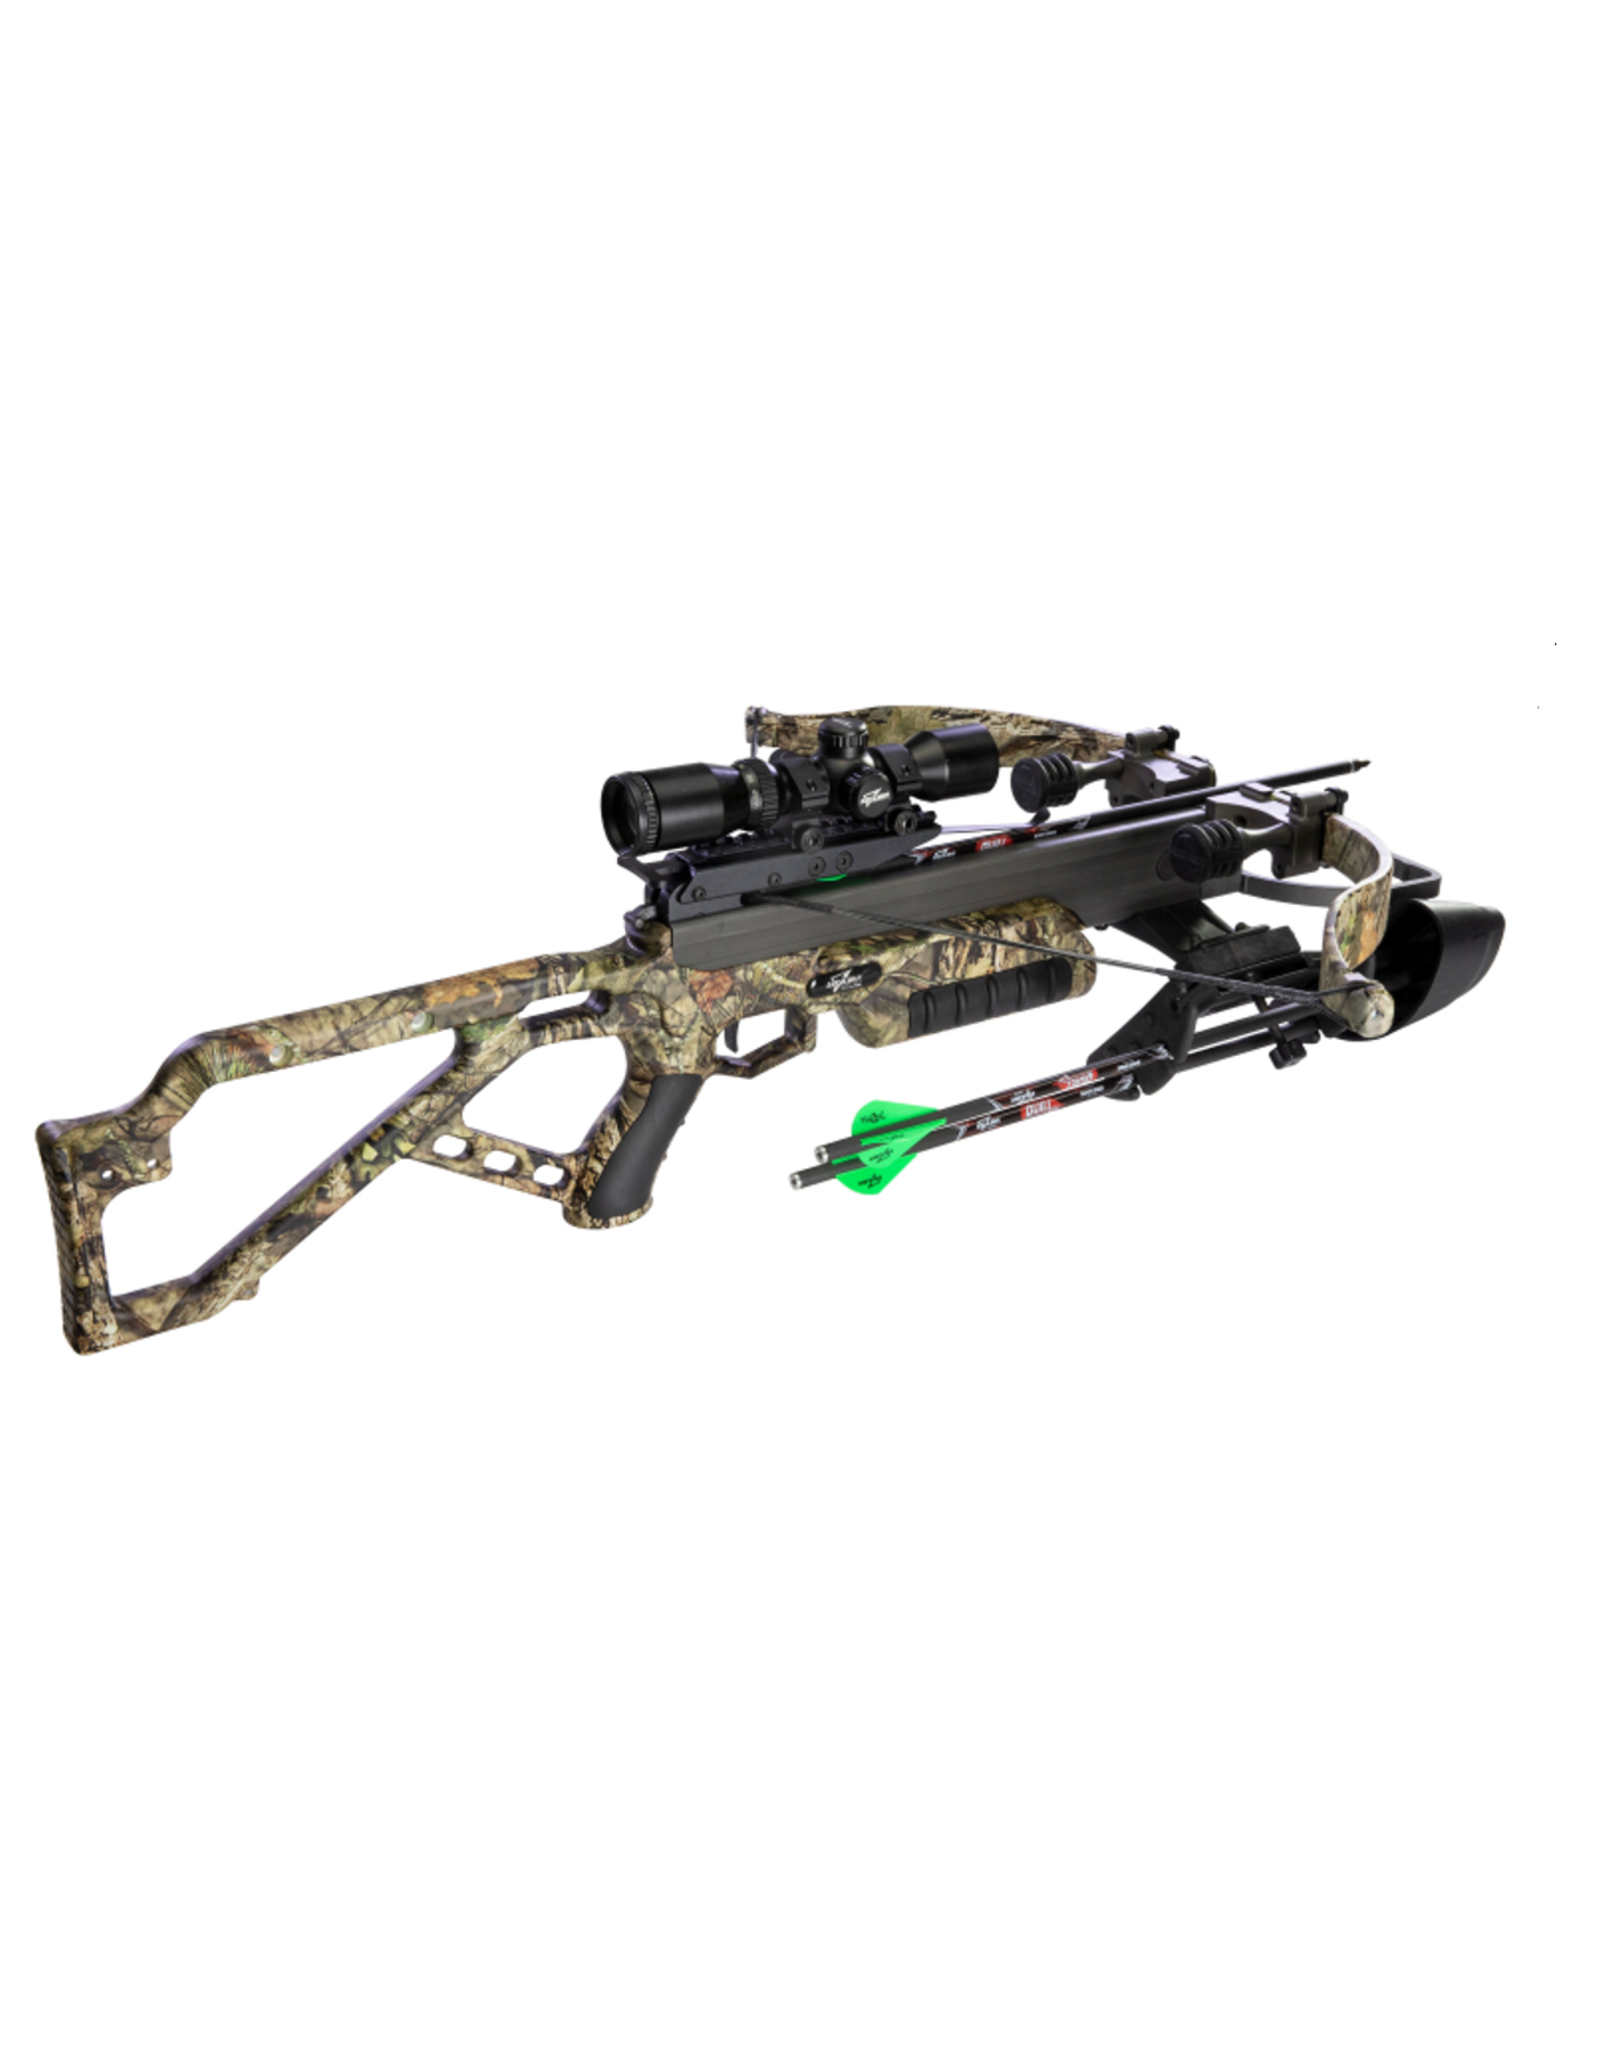 Excalibur Crossbows EXCALIBUR MAG 340 CROSSBOW PKG #E74132